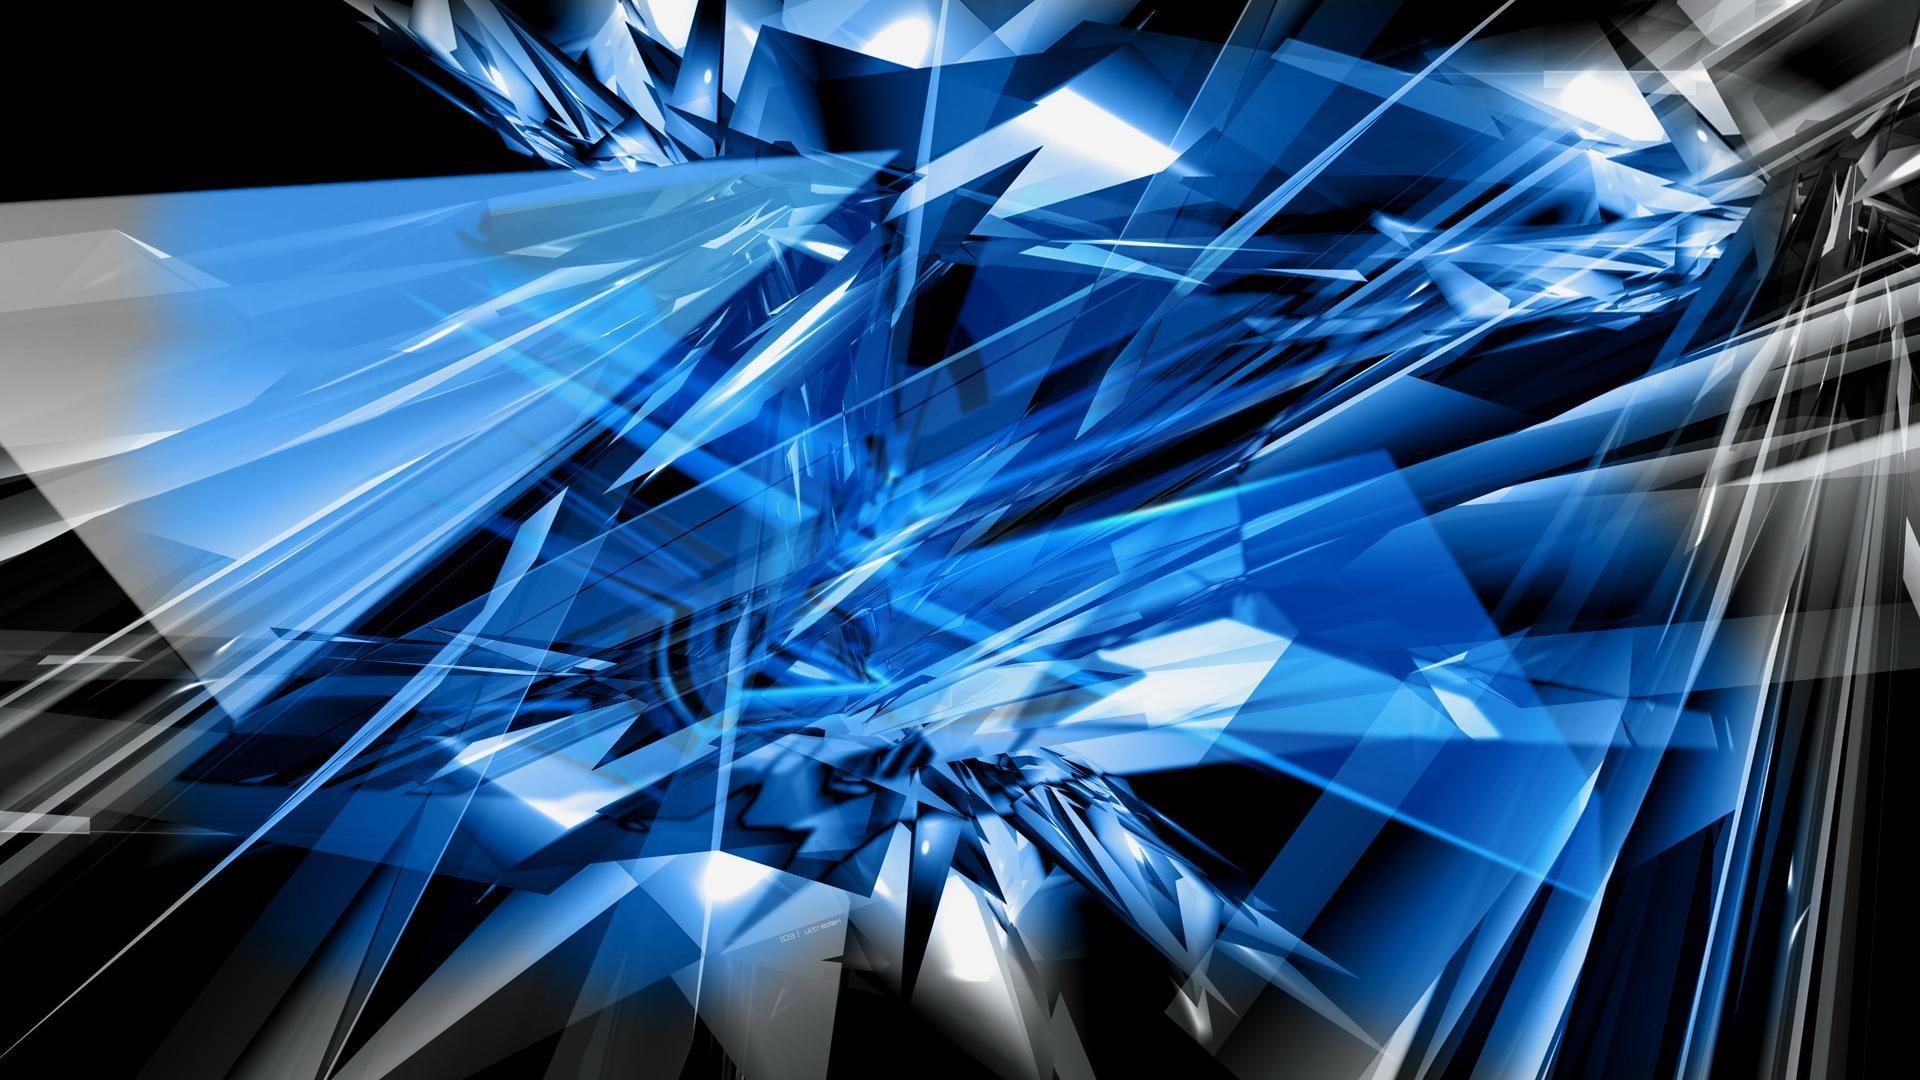 backgrounds, blue, abstract, wallpaper, desktop, design, images